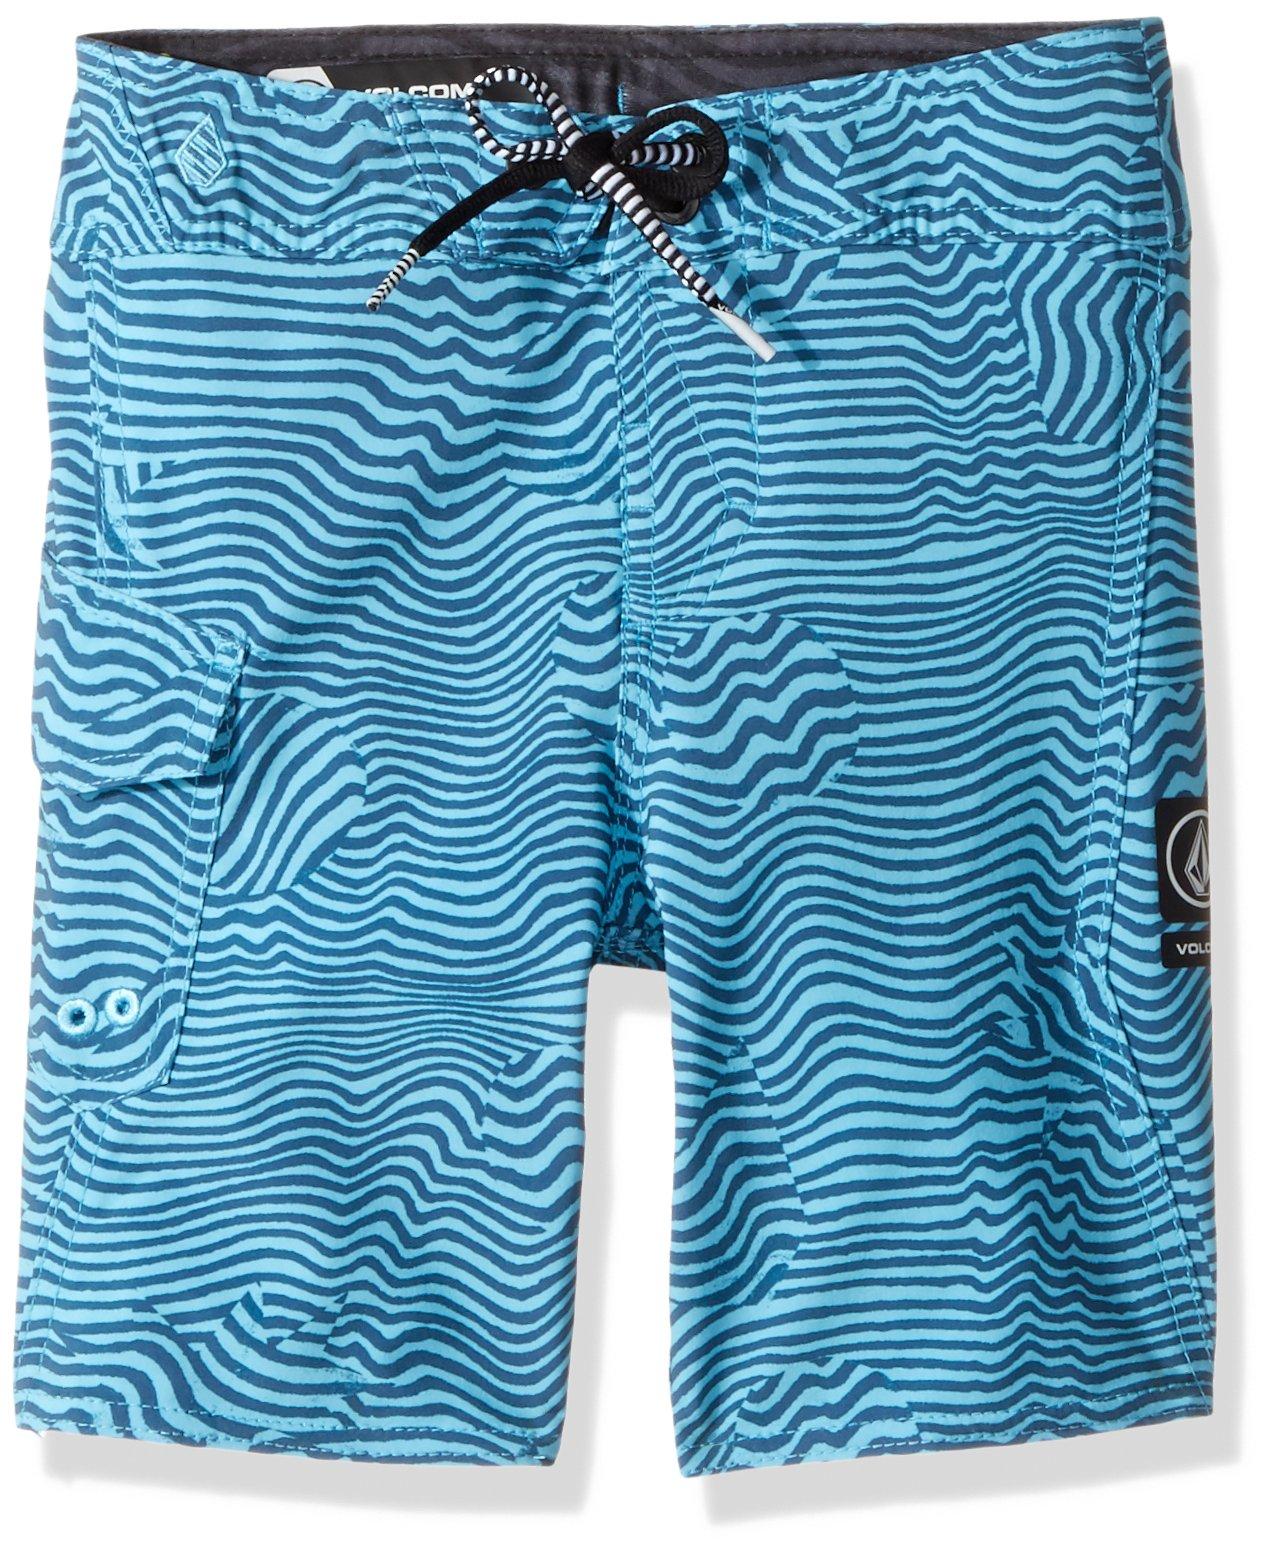 Volcom Little Boys' Magnetic Stone 13.5'' Youth Boardshort, Dusty Aqua, 6